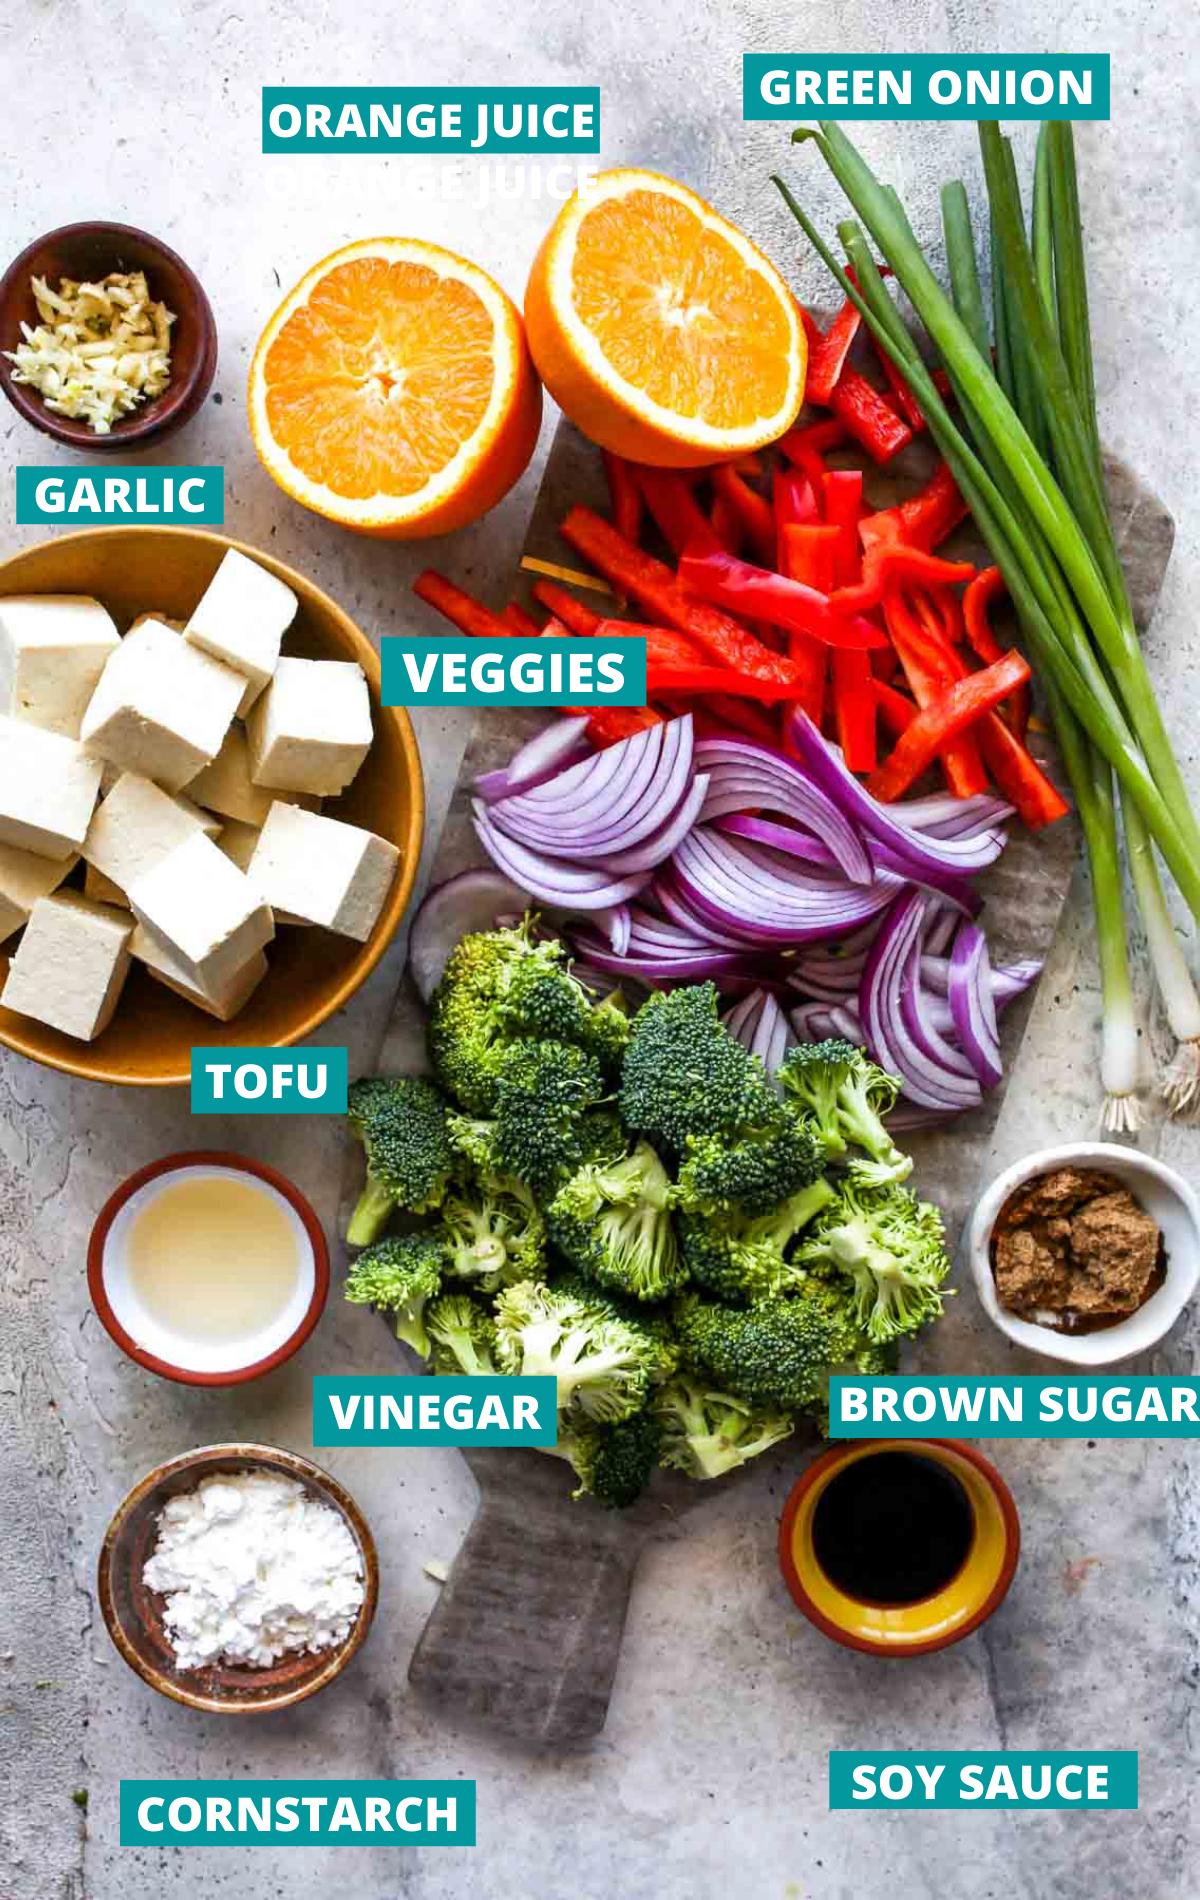 Vegan orange chicken ingredients in separate bowls with blue labels